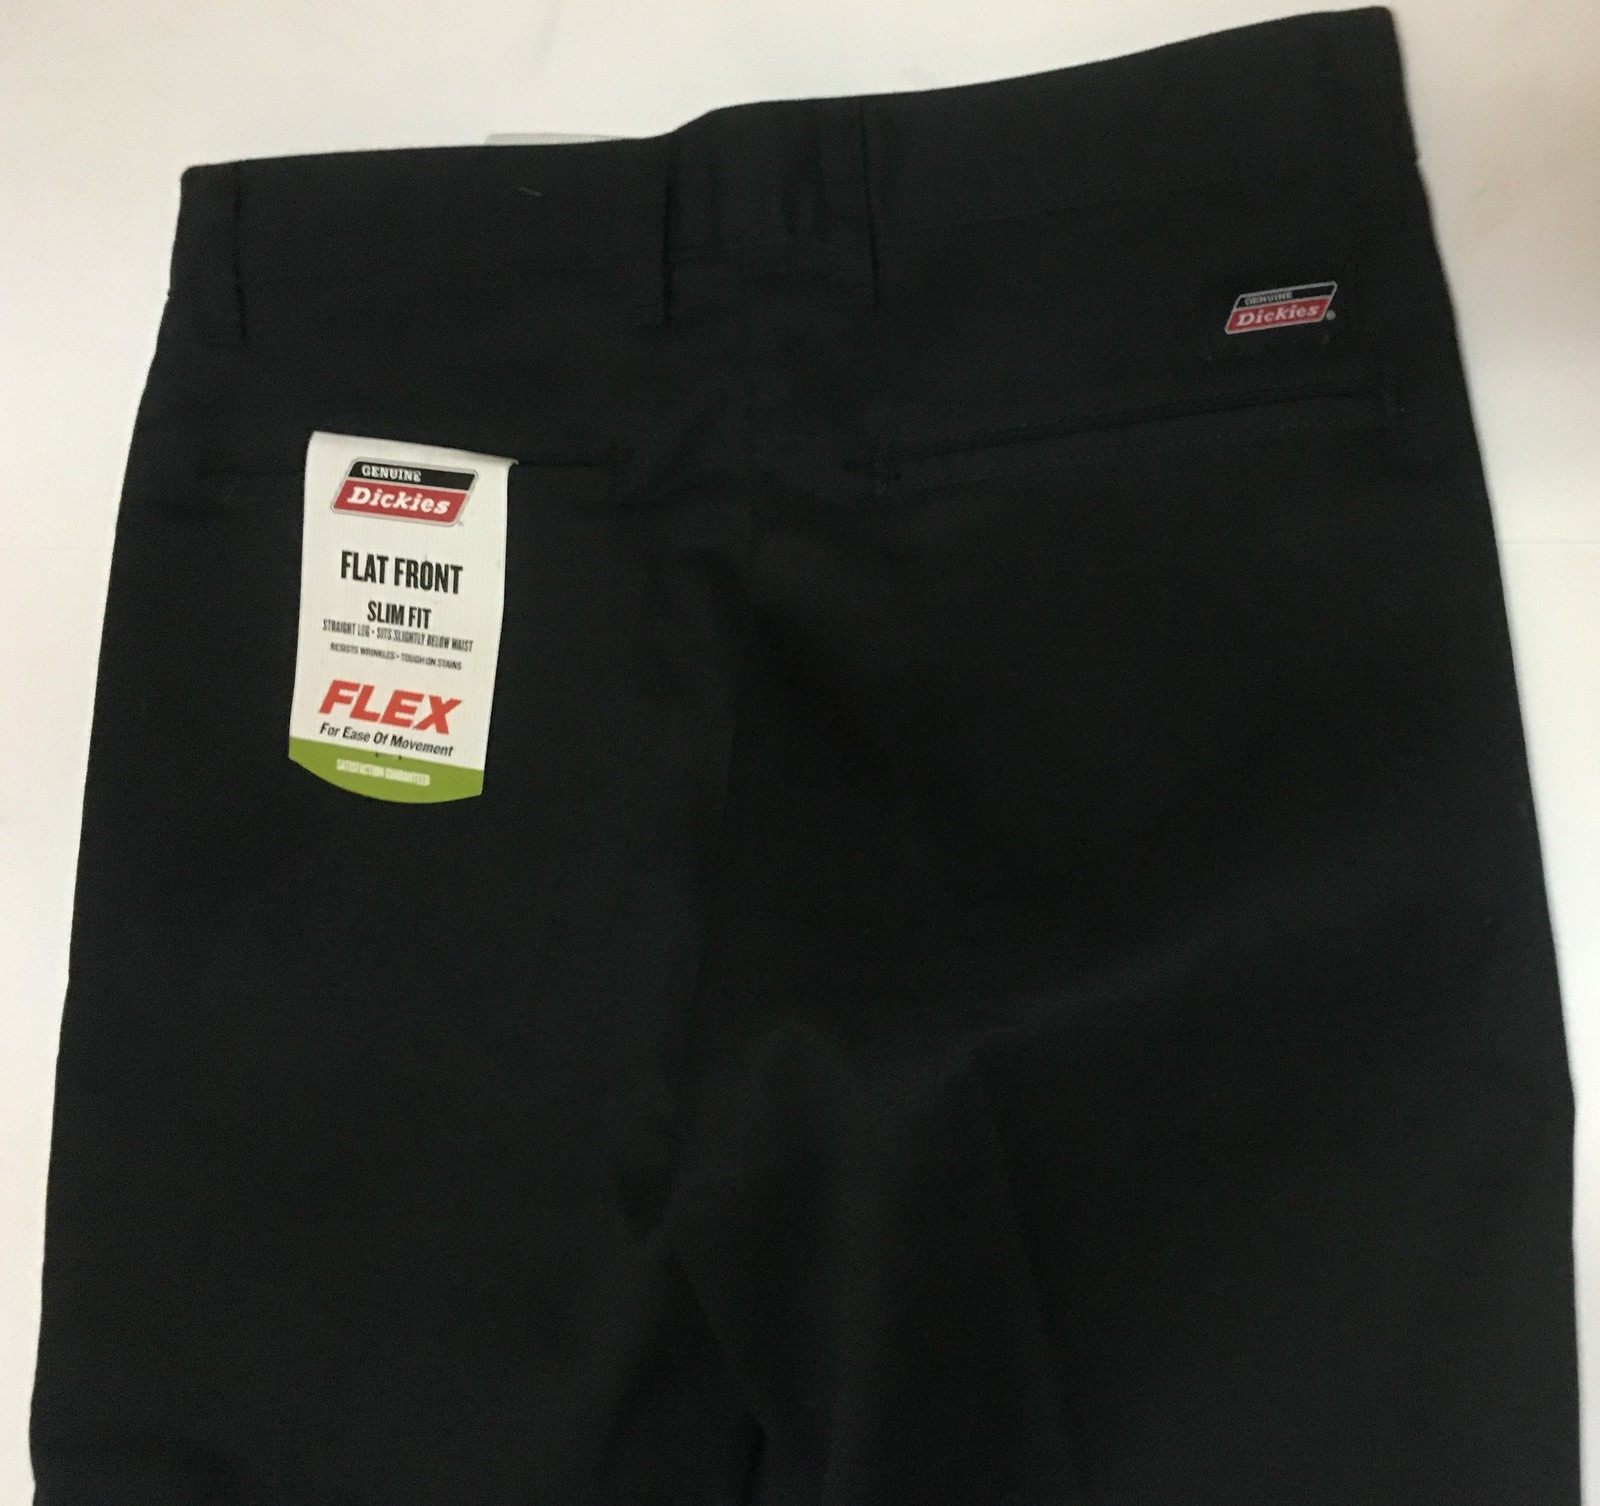 Dickies Genuine Flat Front Slim Fit Flex Pants Black Sz 30 x 32